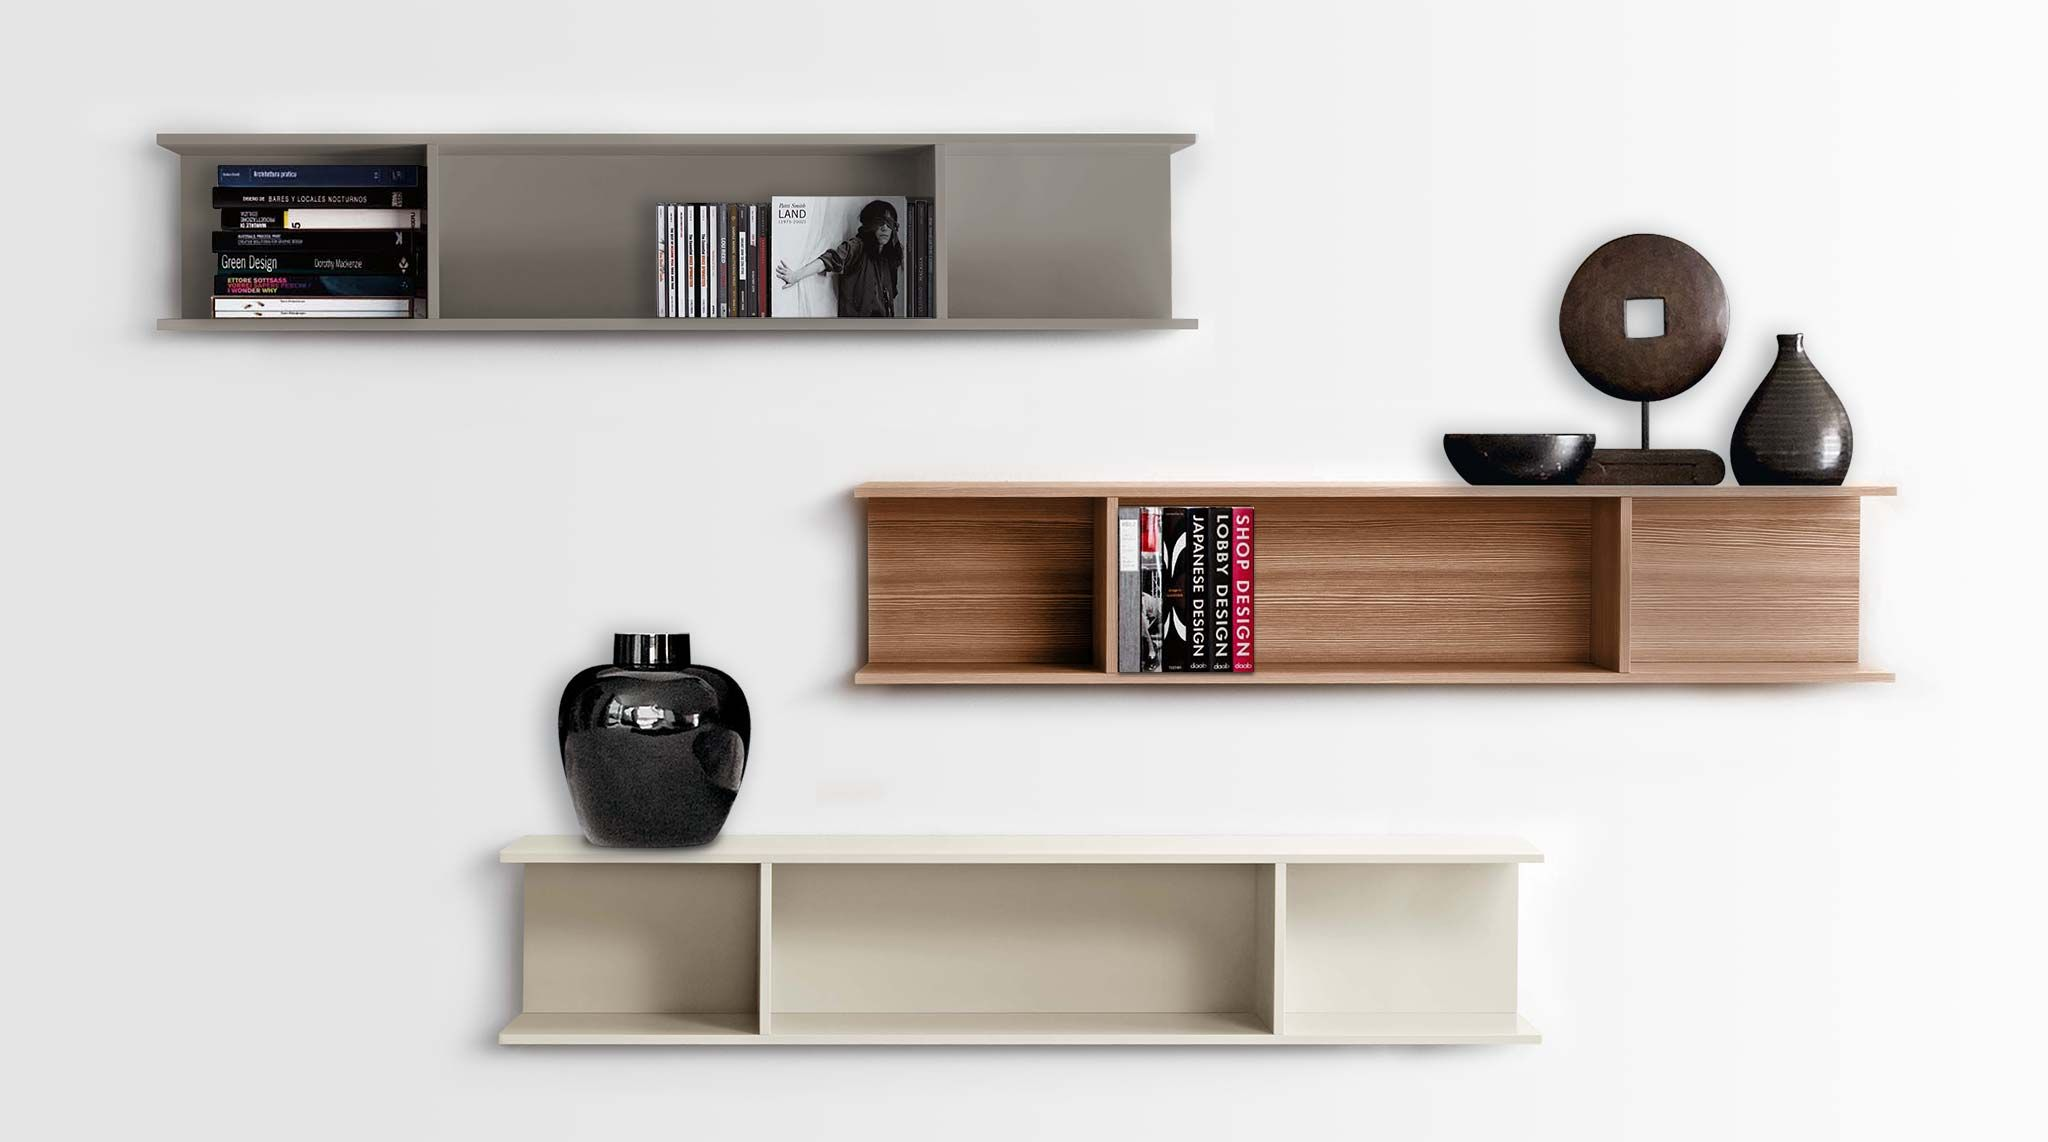 Arredamento Libreria ~ Libreria modulare pensile a muro light sololibrerie vendita